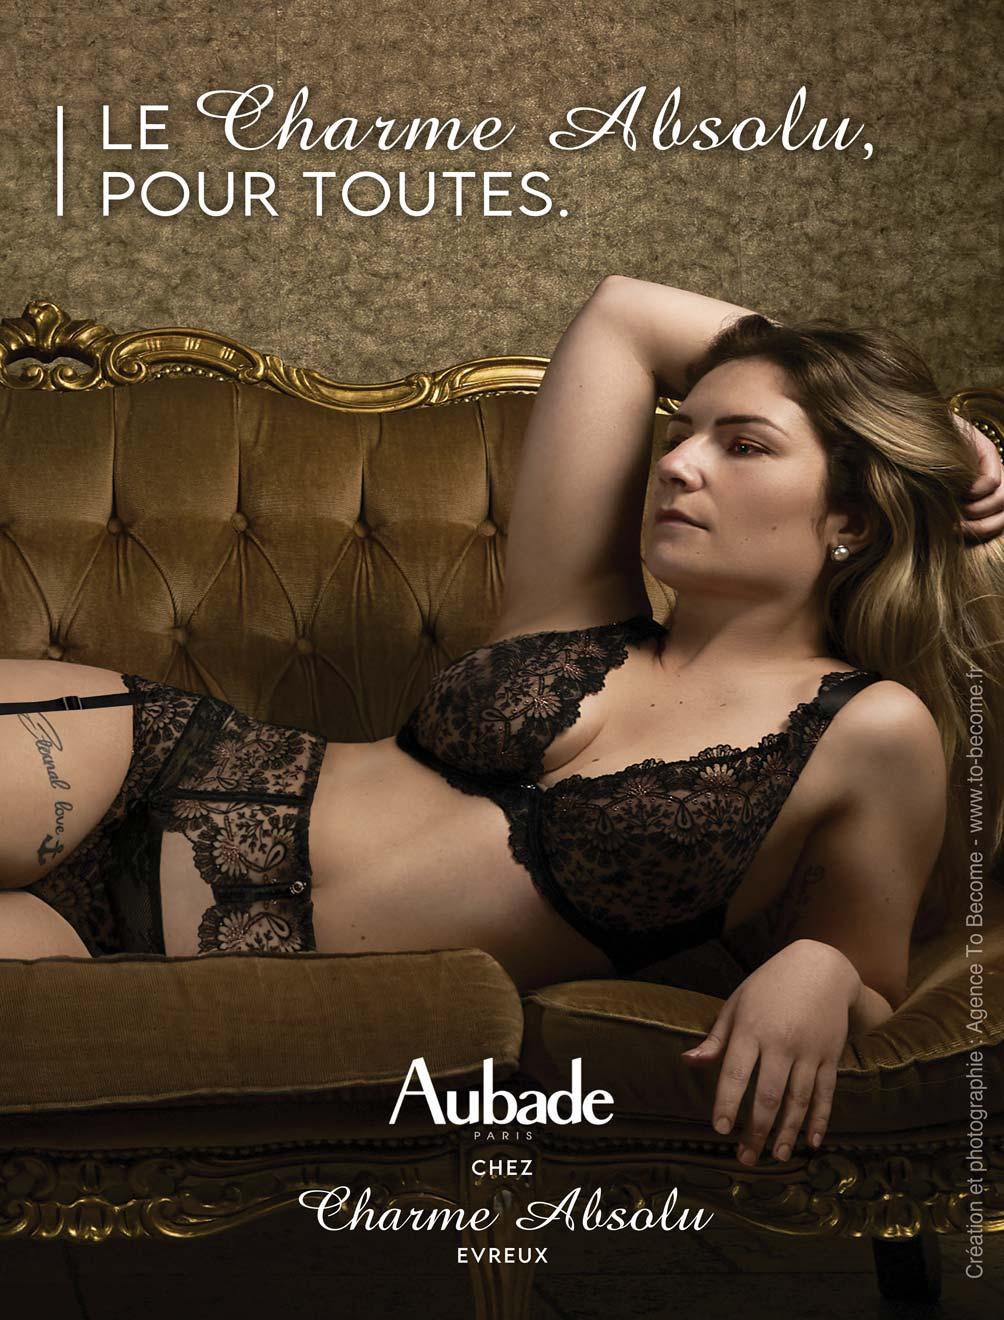 to-become-communication-graphisme-marketing-impression-digital-affiche-charme-absolu-audabe-evreux-1